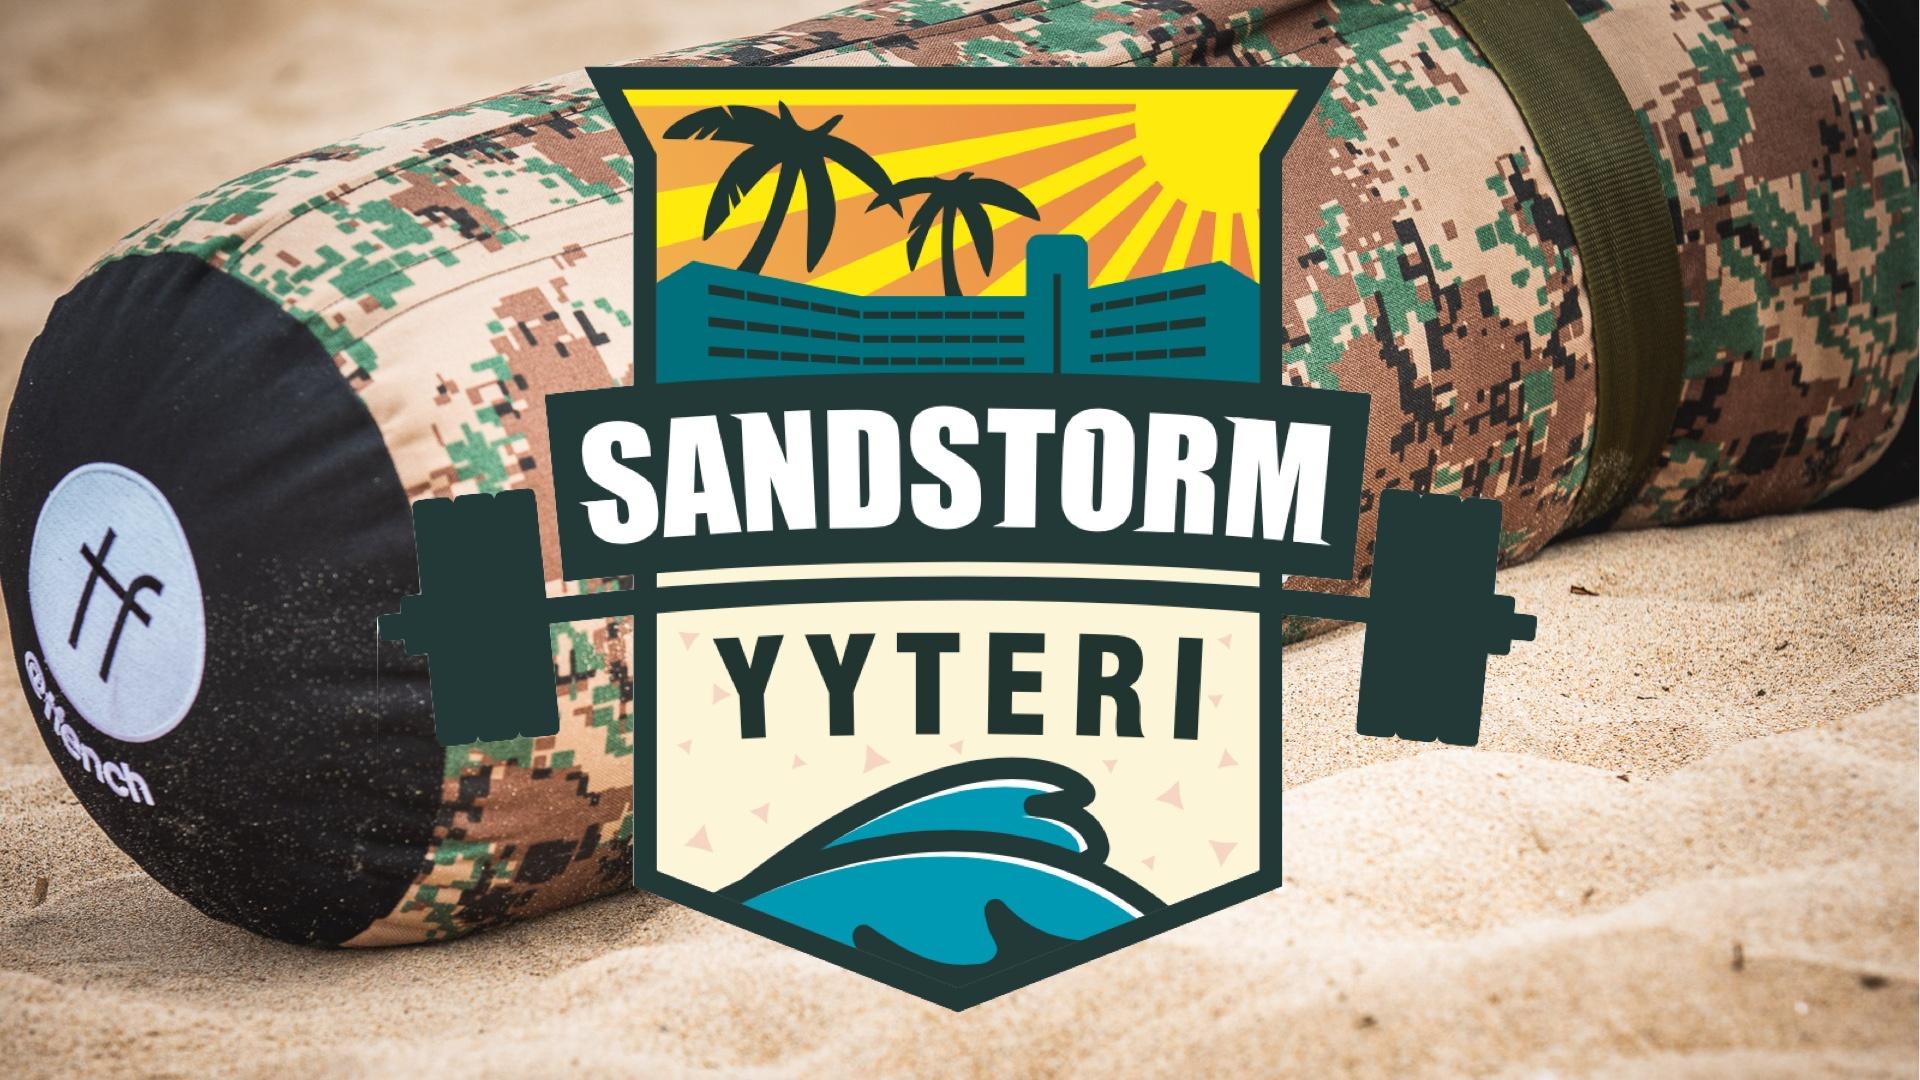 Yyteri Sandstorm 2021